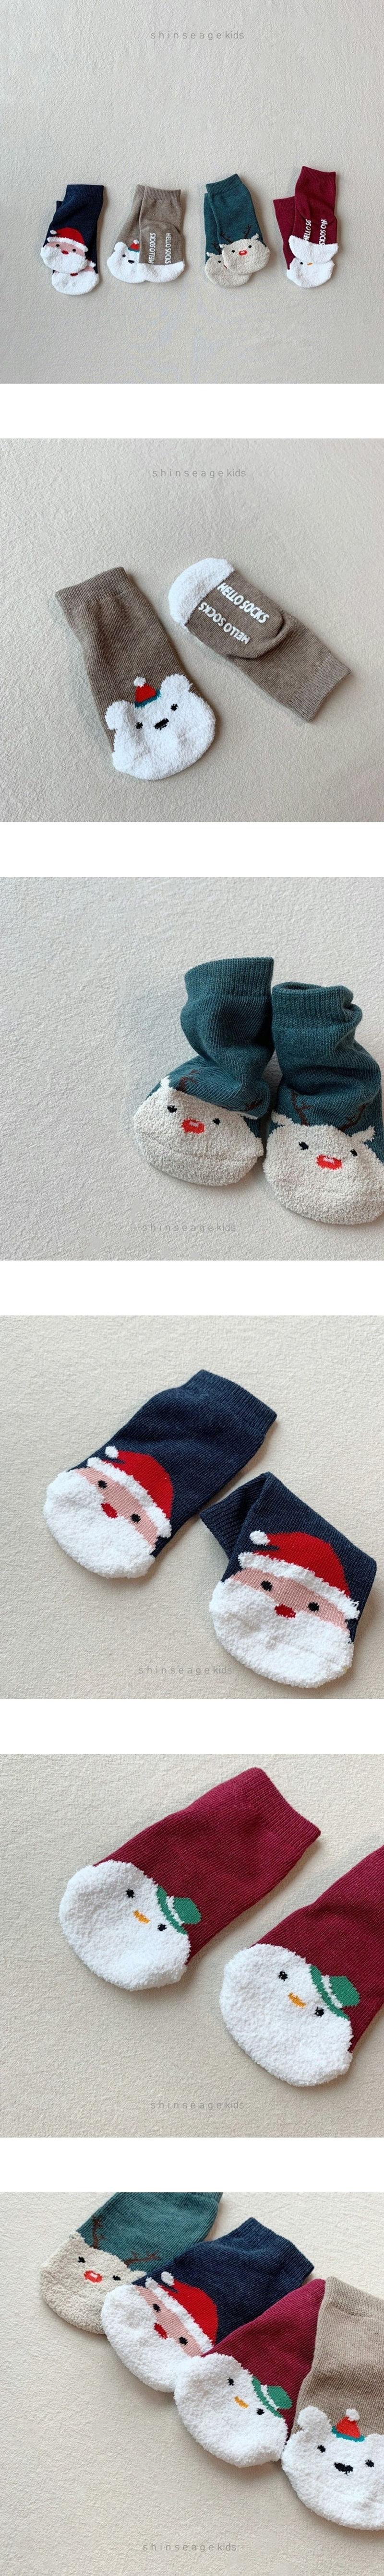 SHINSEAGE KIDS - Korean Children Fashion - #Kfashion4kids - Christmas Socks [set of 4]